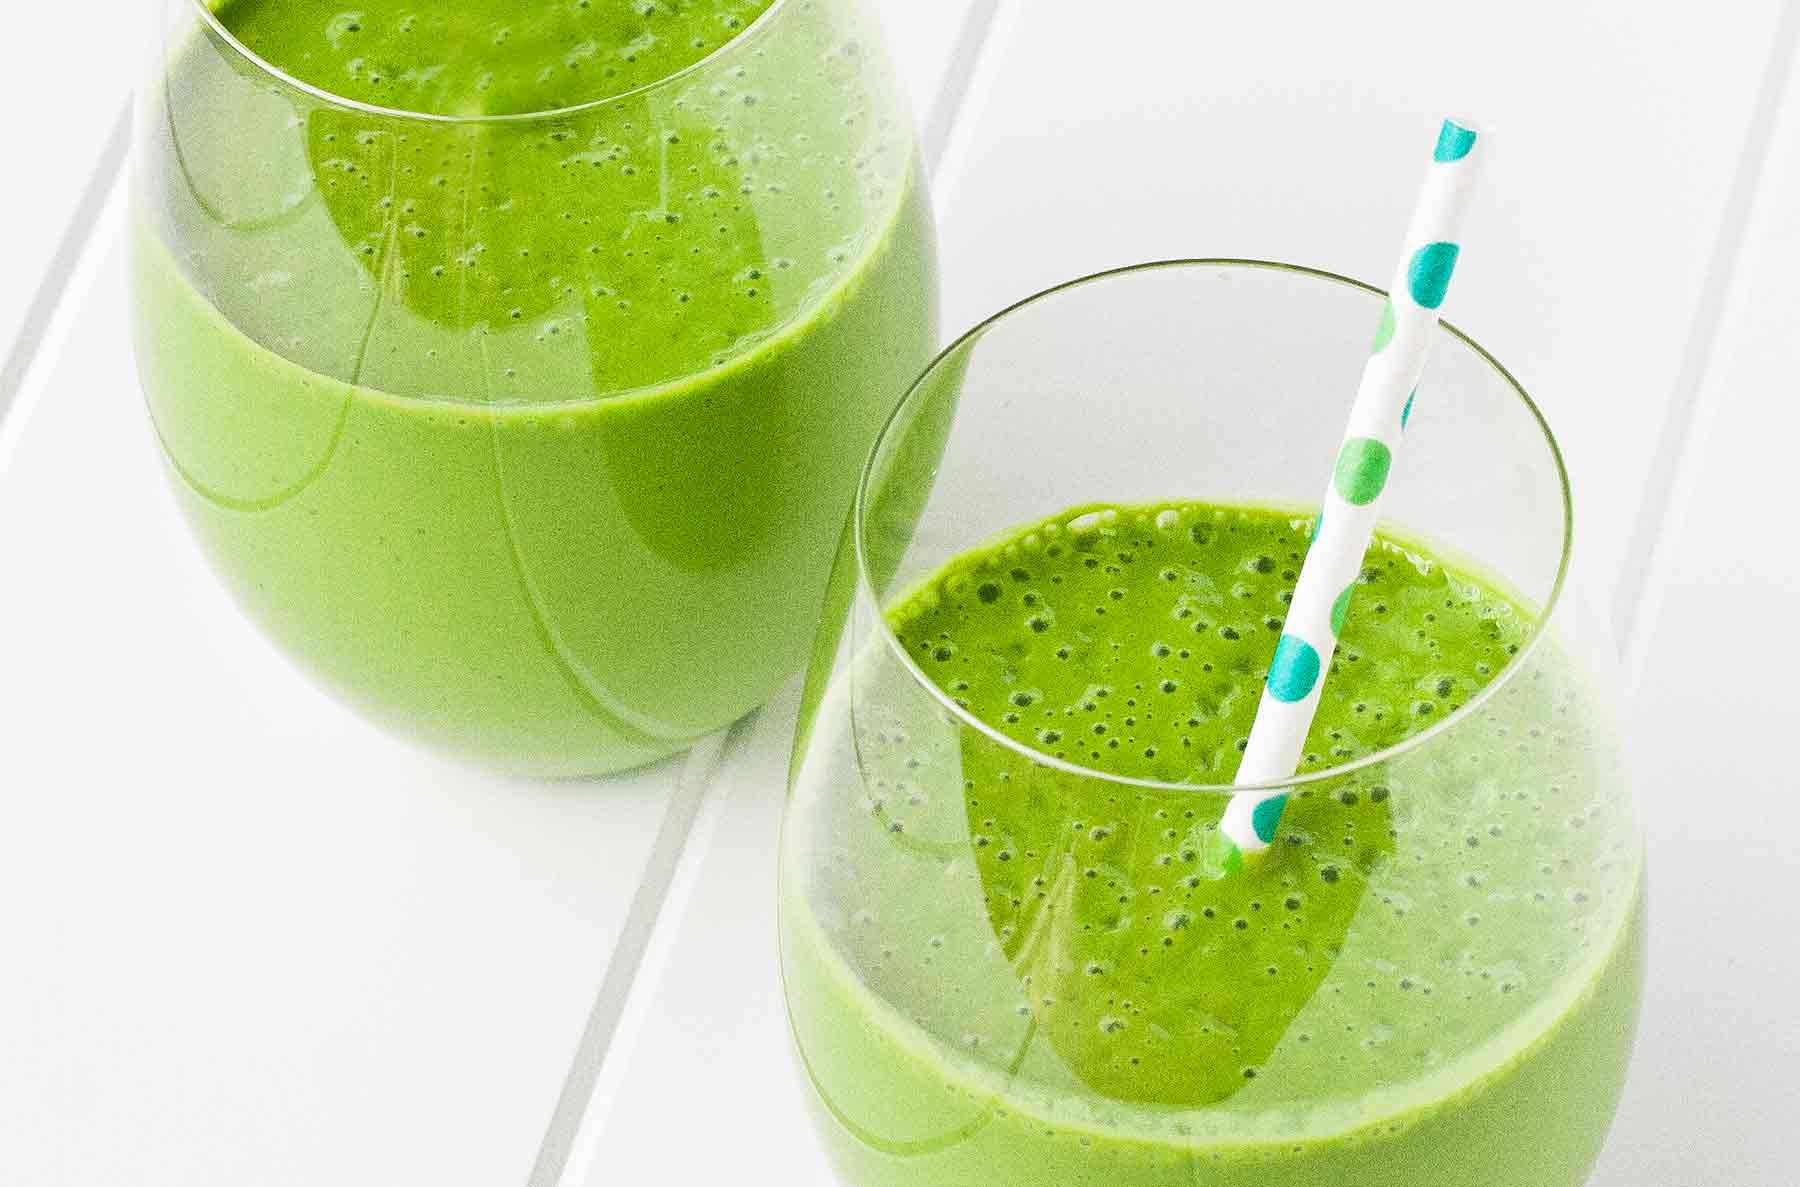 zelen-pijalak-za-zabrzuvanje-na-metabolizmot-i-detoksikacija-na-organizmot-www.kafepauza.mk